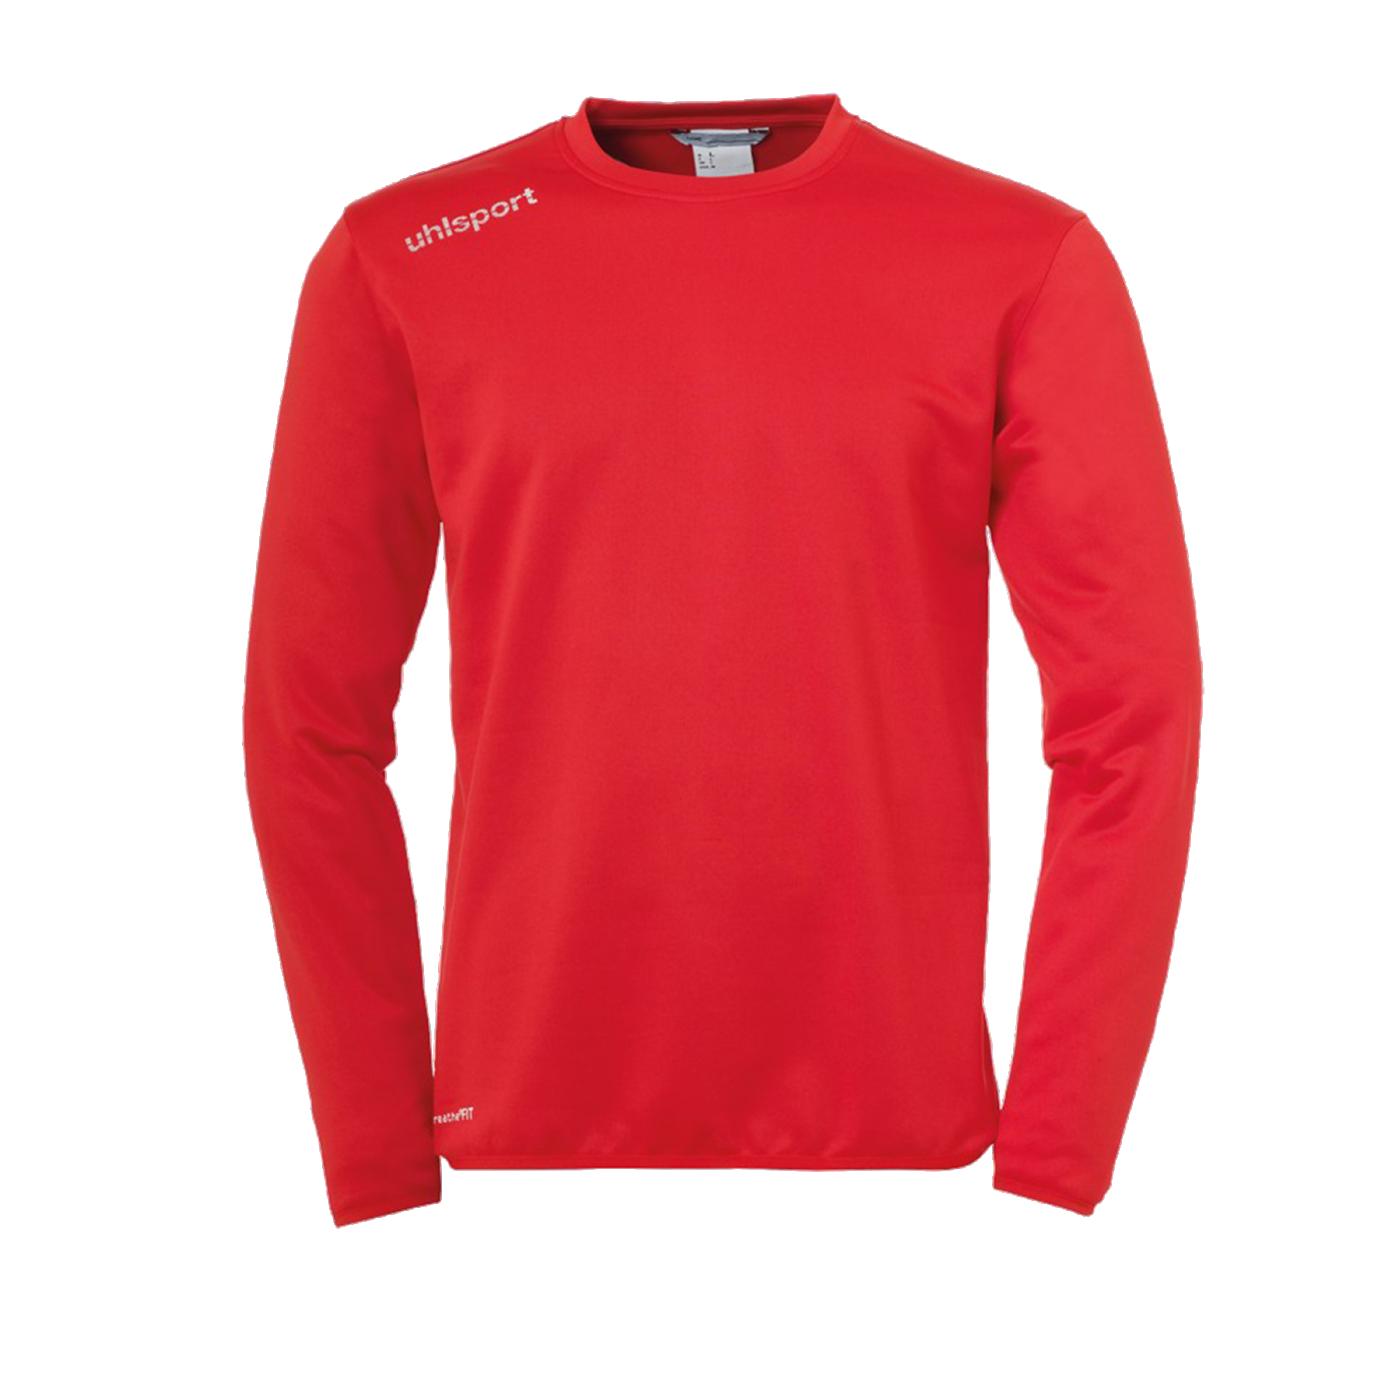 Uhlsport ESSENTIAL TRAINING TOP 1002209 Sweat Shirt Herren Kinder Langarm Pulli